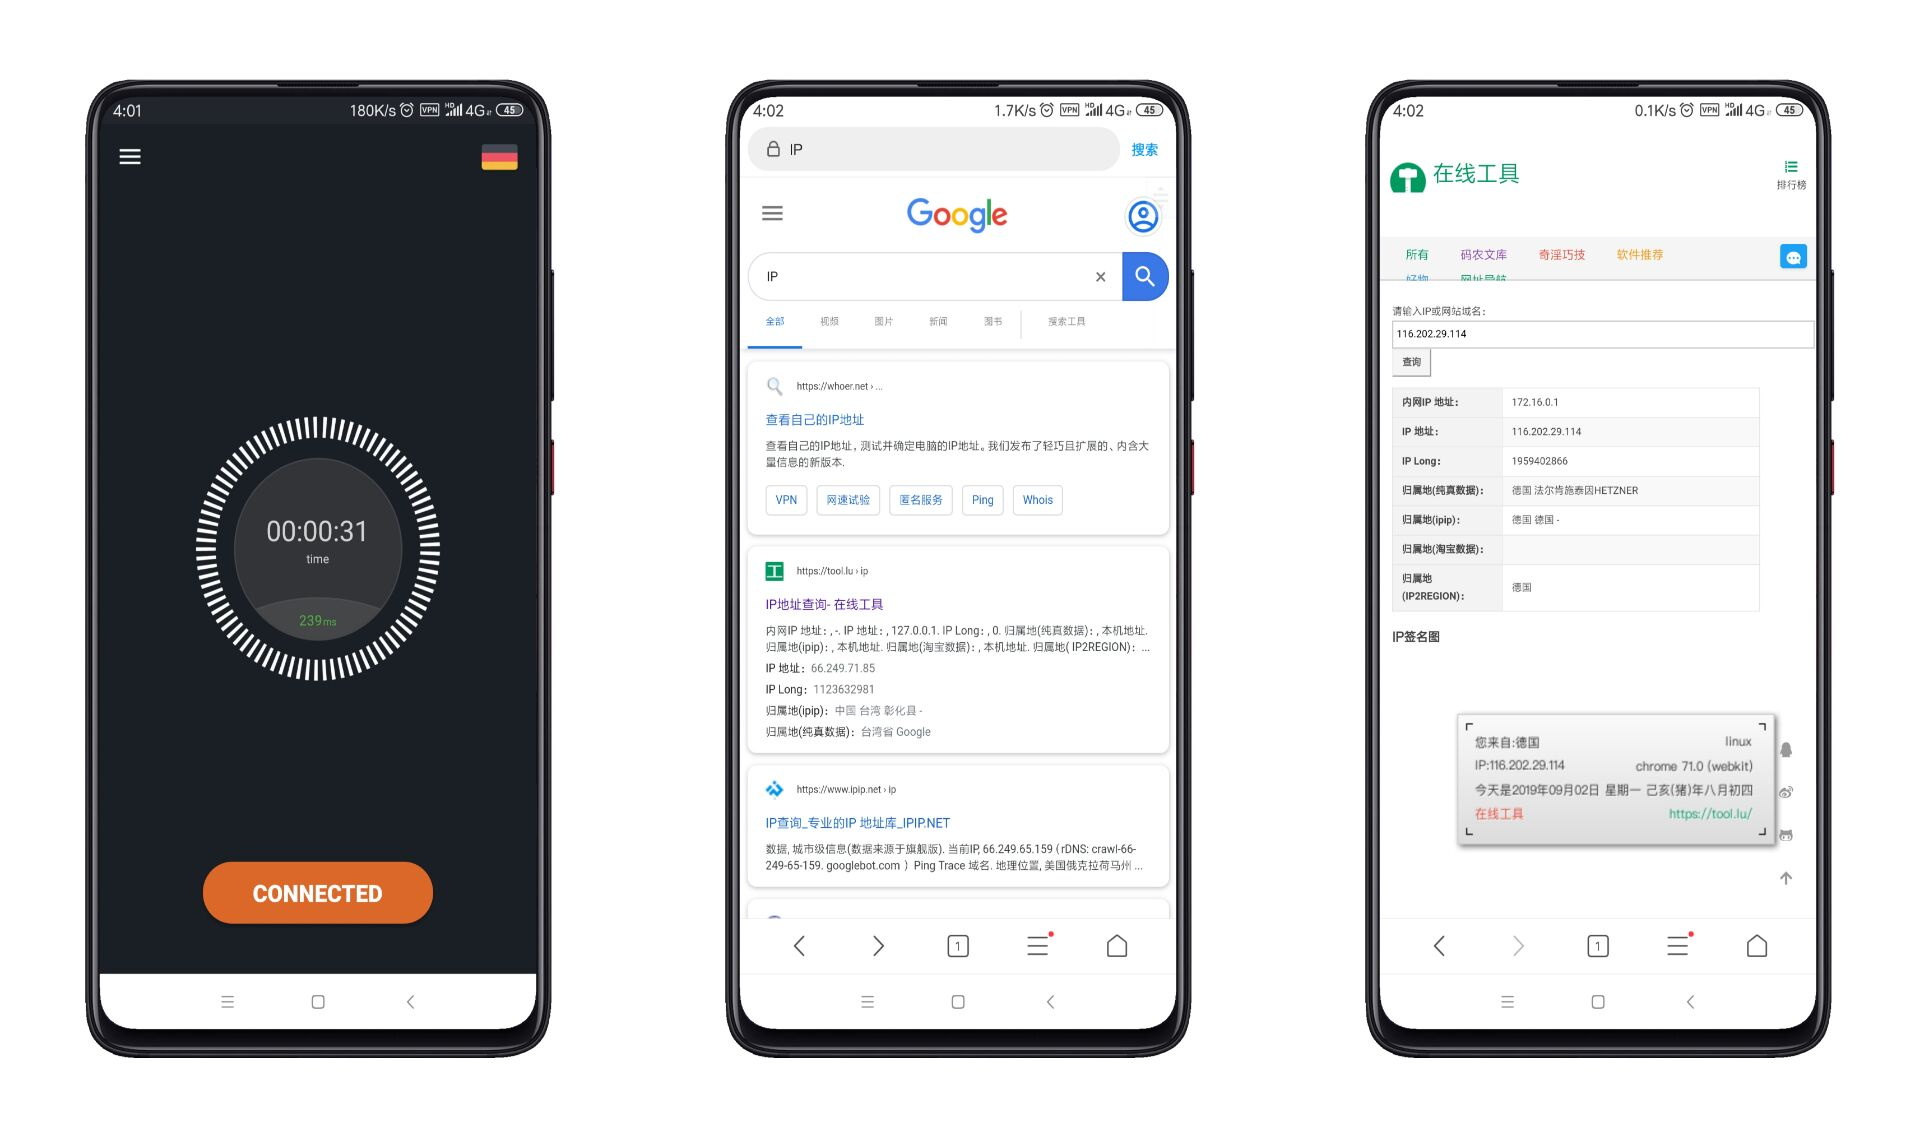 SEcure VPN秒上谷歌去谷歌广告